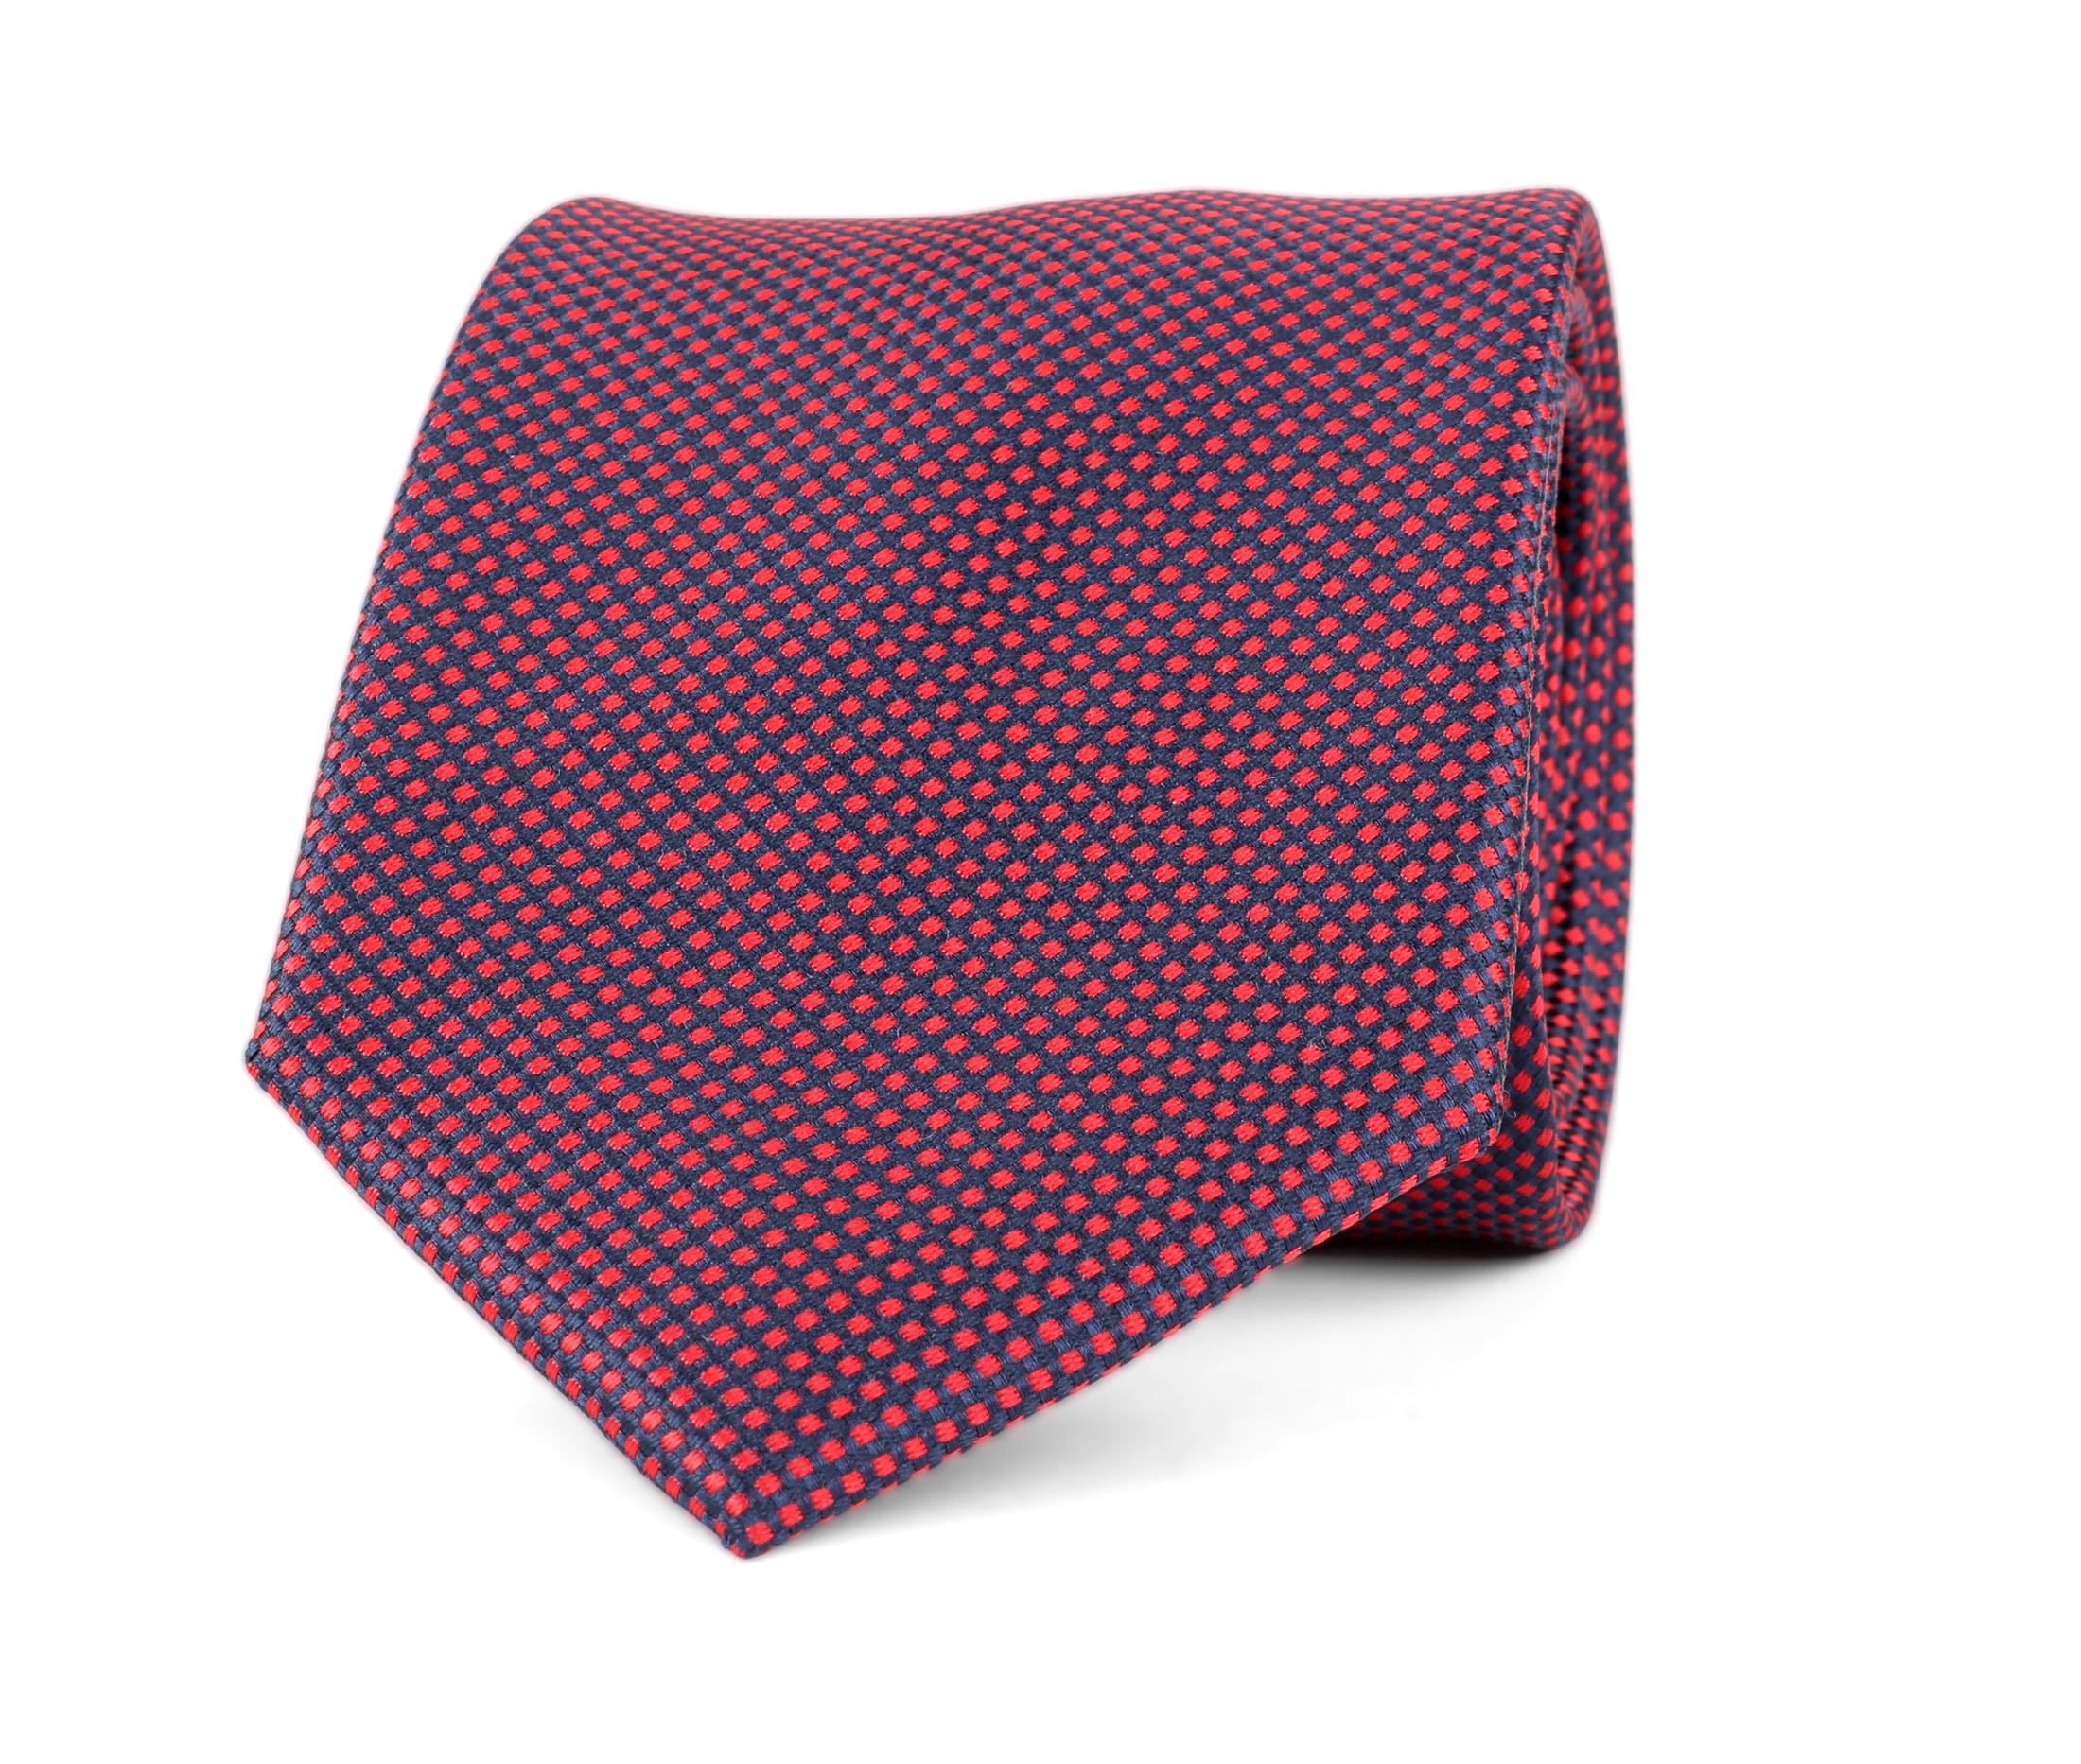 Krawatte Seide Karo Rot 9-17 foto 0